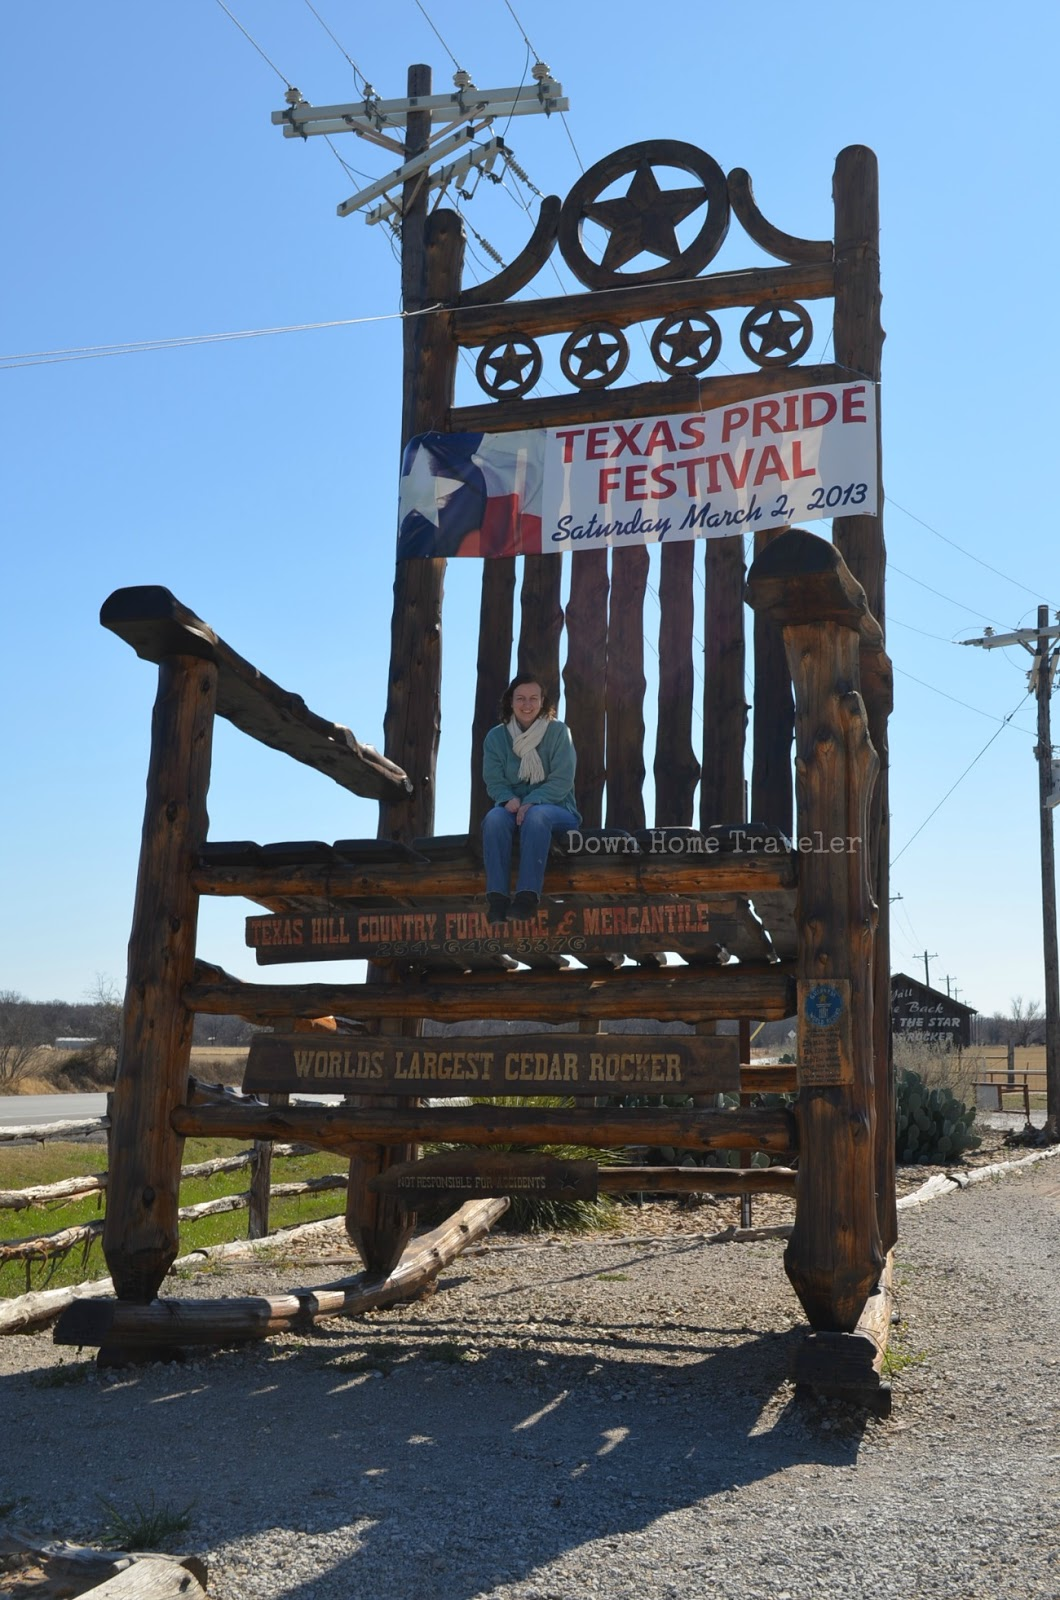 Excellent Texas Sized Rocker Down Home Traveler Frankydiablos Diy Chair Ideas Frankydiabloscom